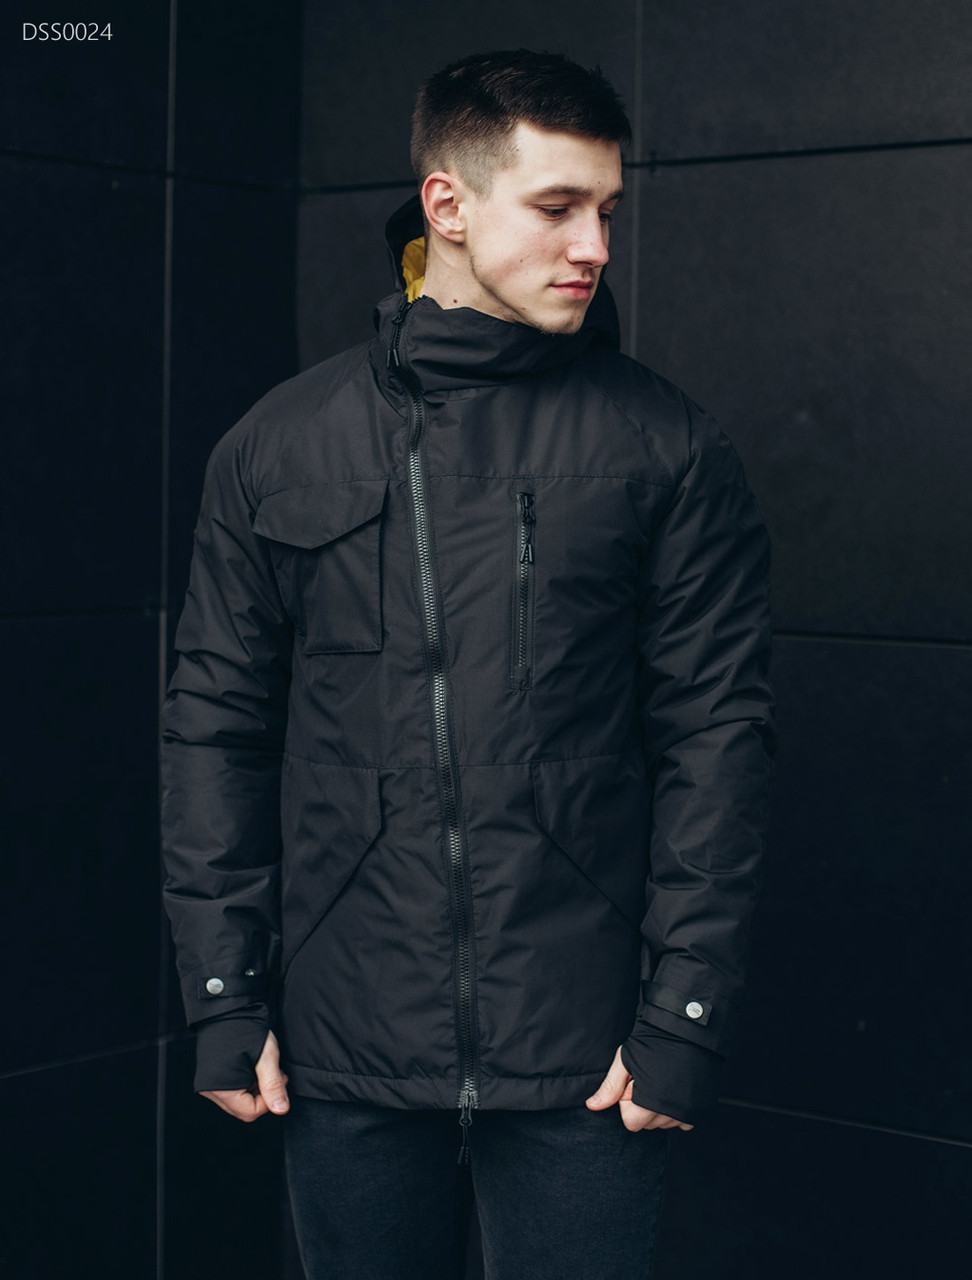 3e4b520f81e Куртка Staff black asymmetry - Интернет магазин Babuza в Черновцах